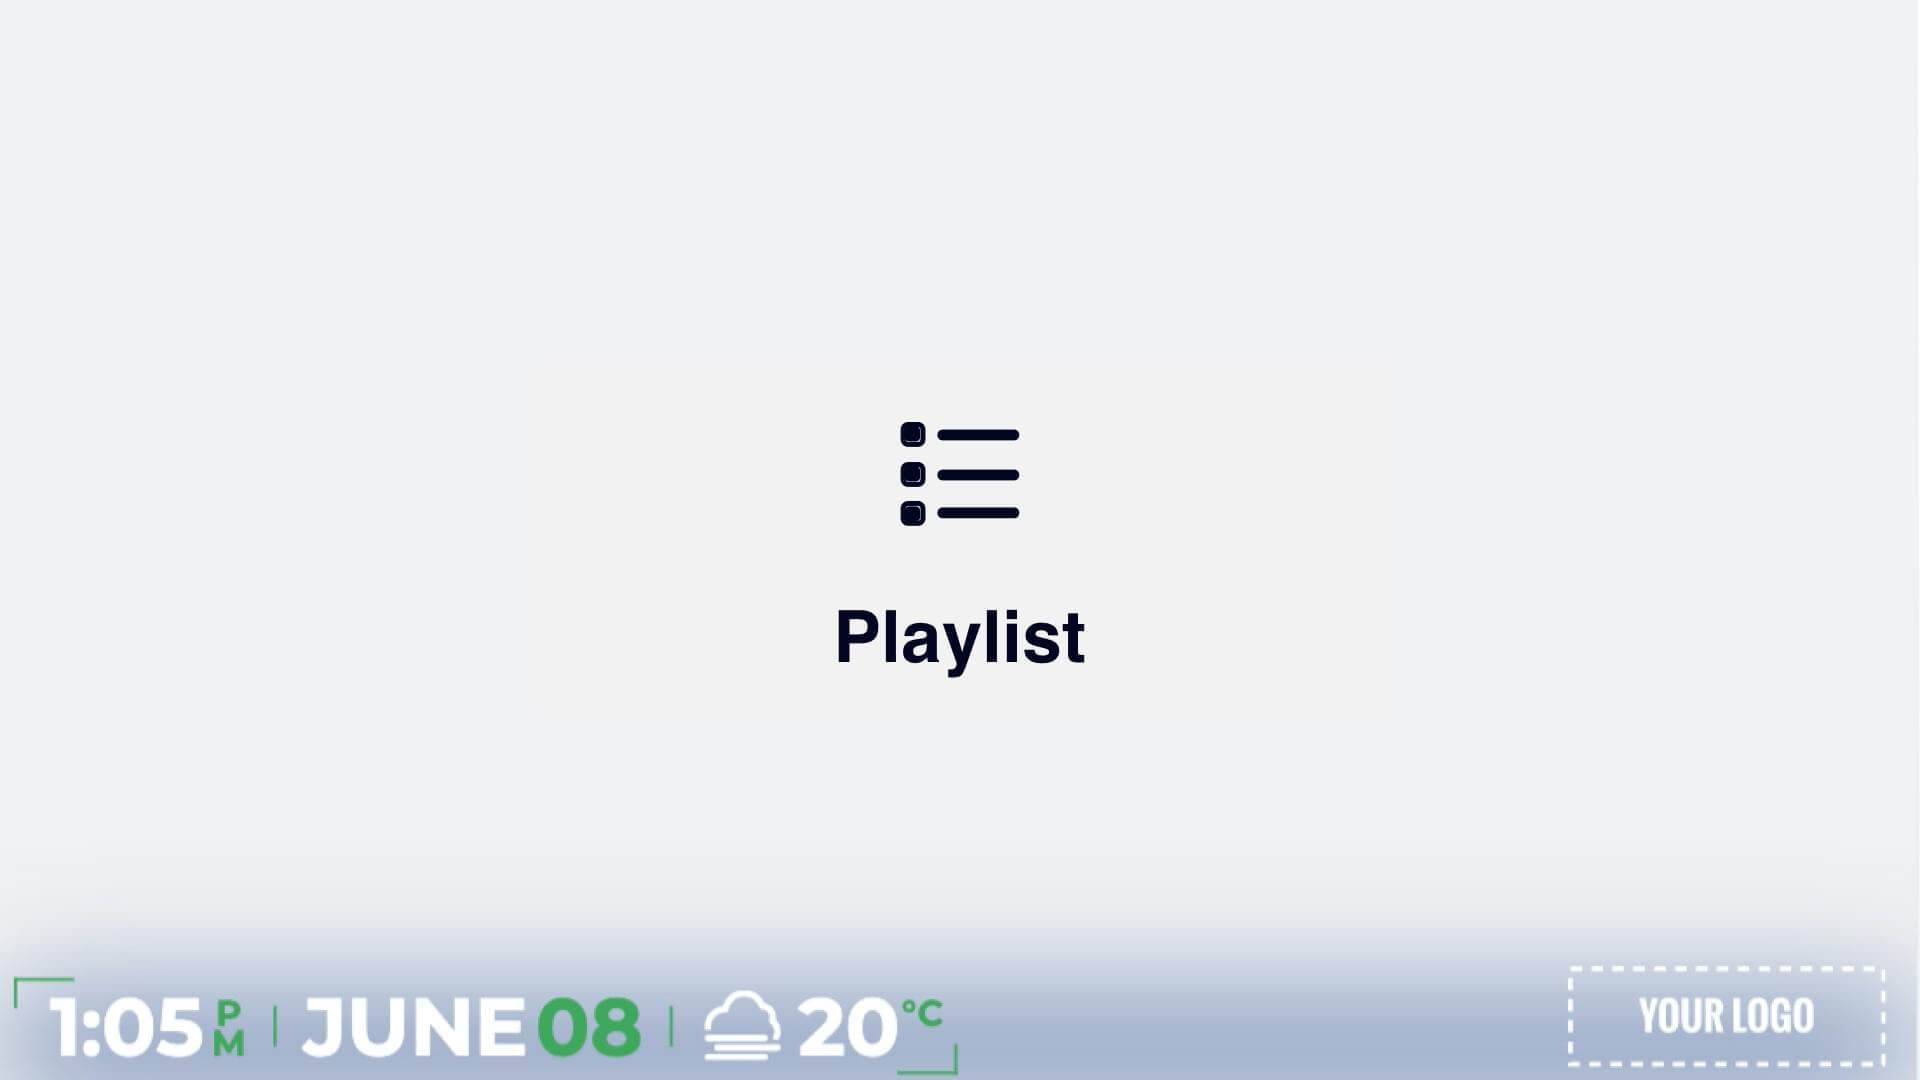 Full Screen Minimal Playlist Presentation Digital Signage Template